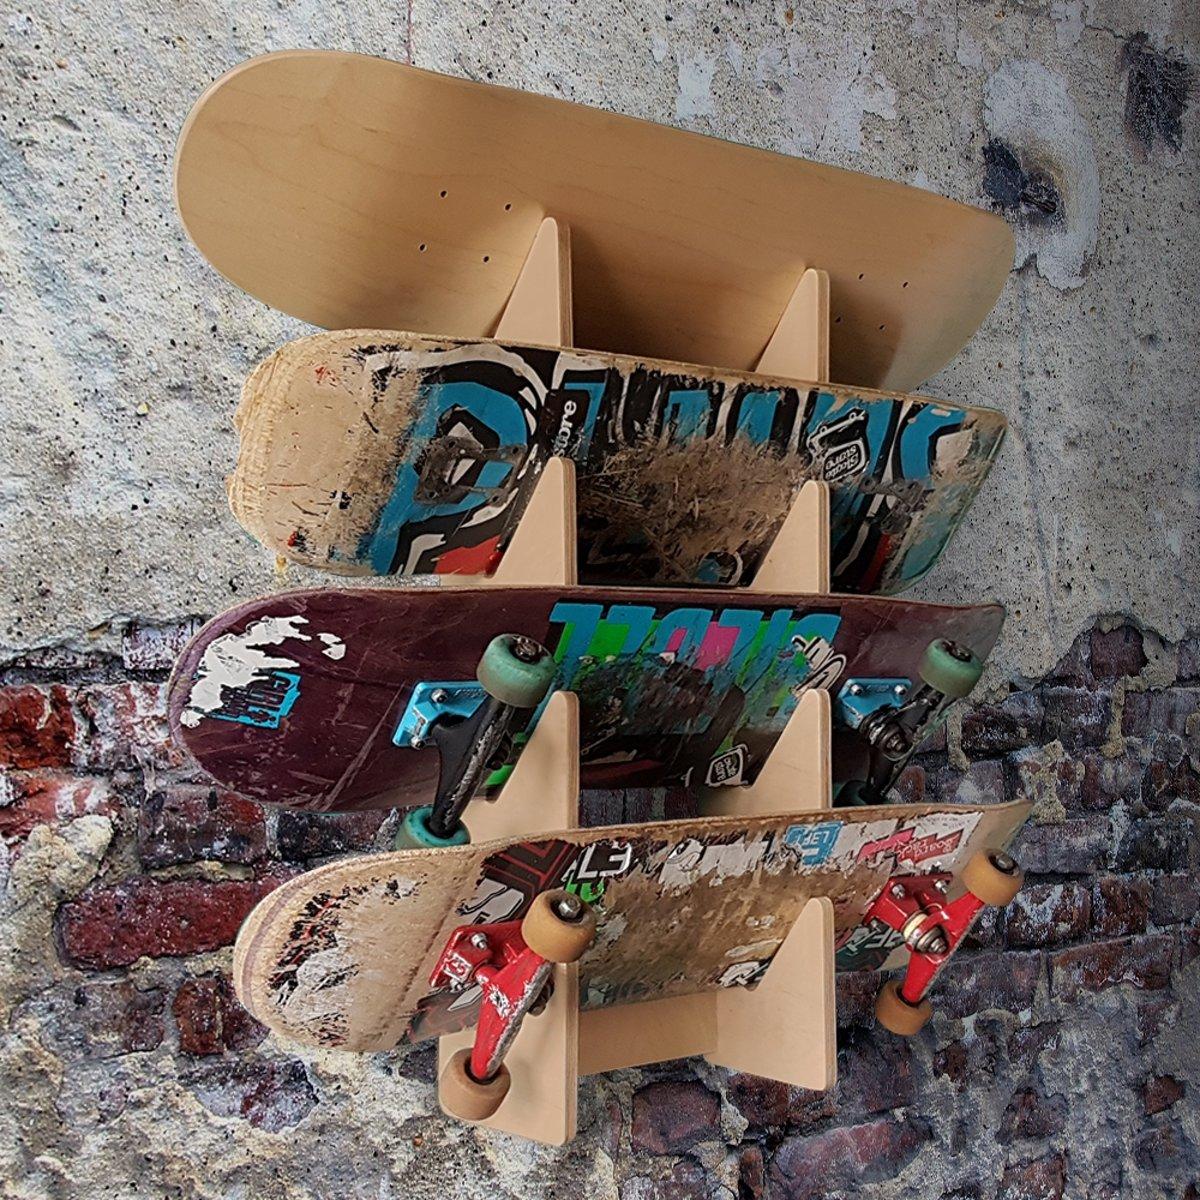 Geliefde bol.com | Board Racks - wandrek voor 4 skateboards @JE32